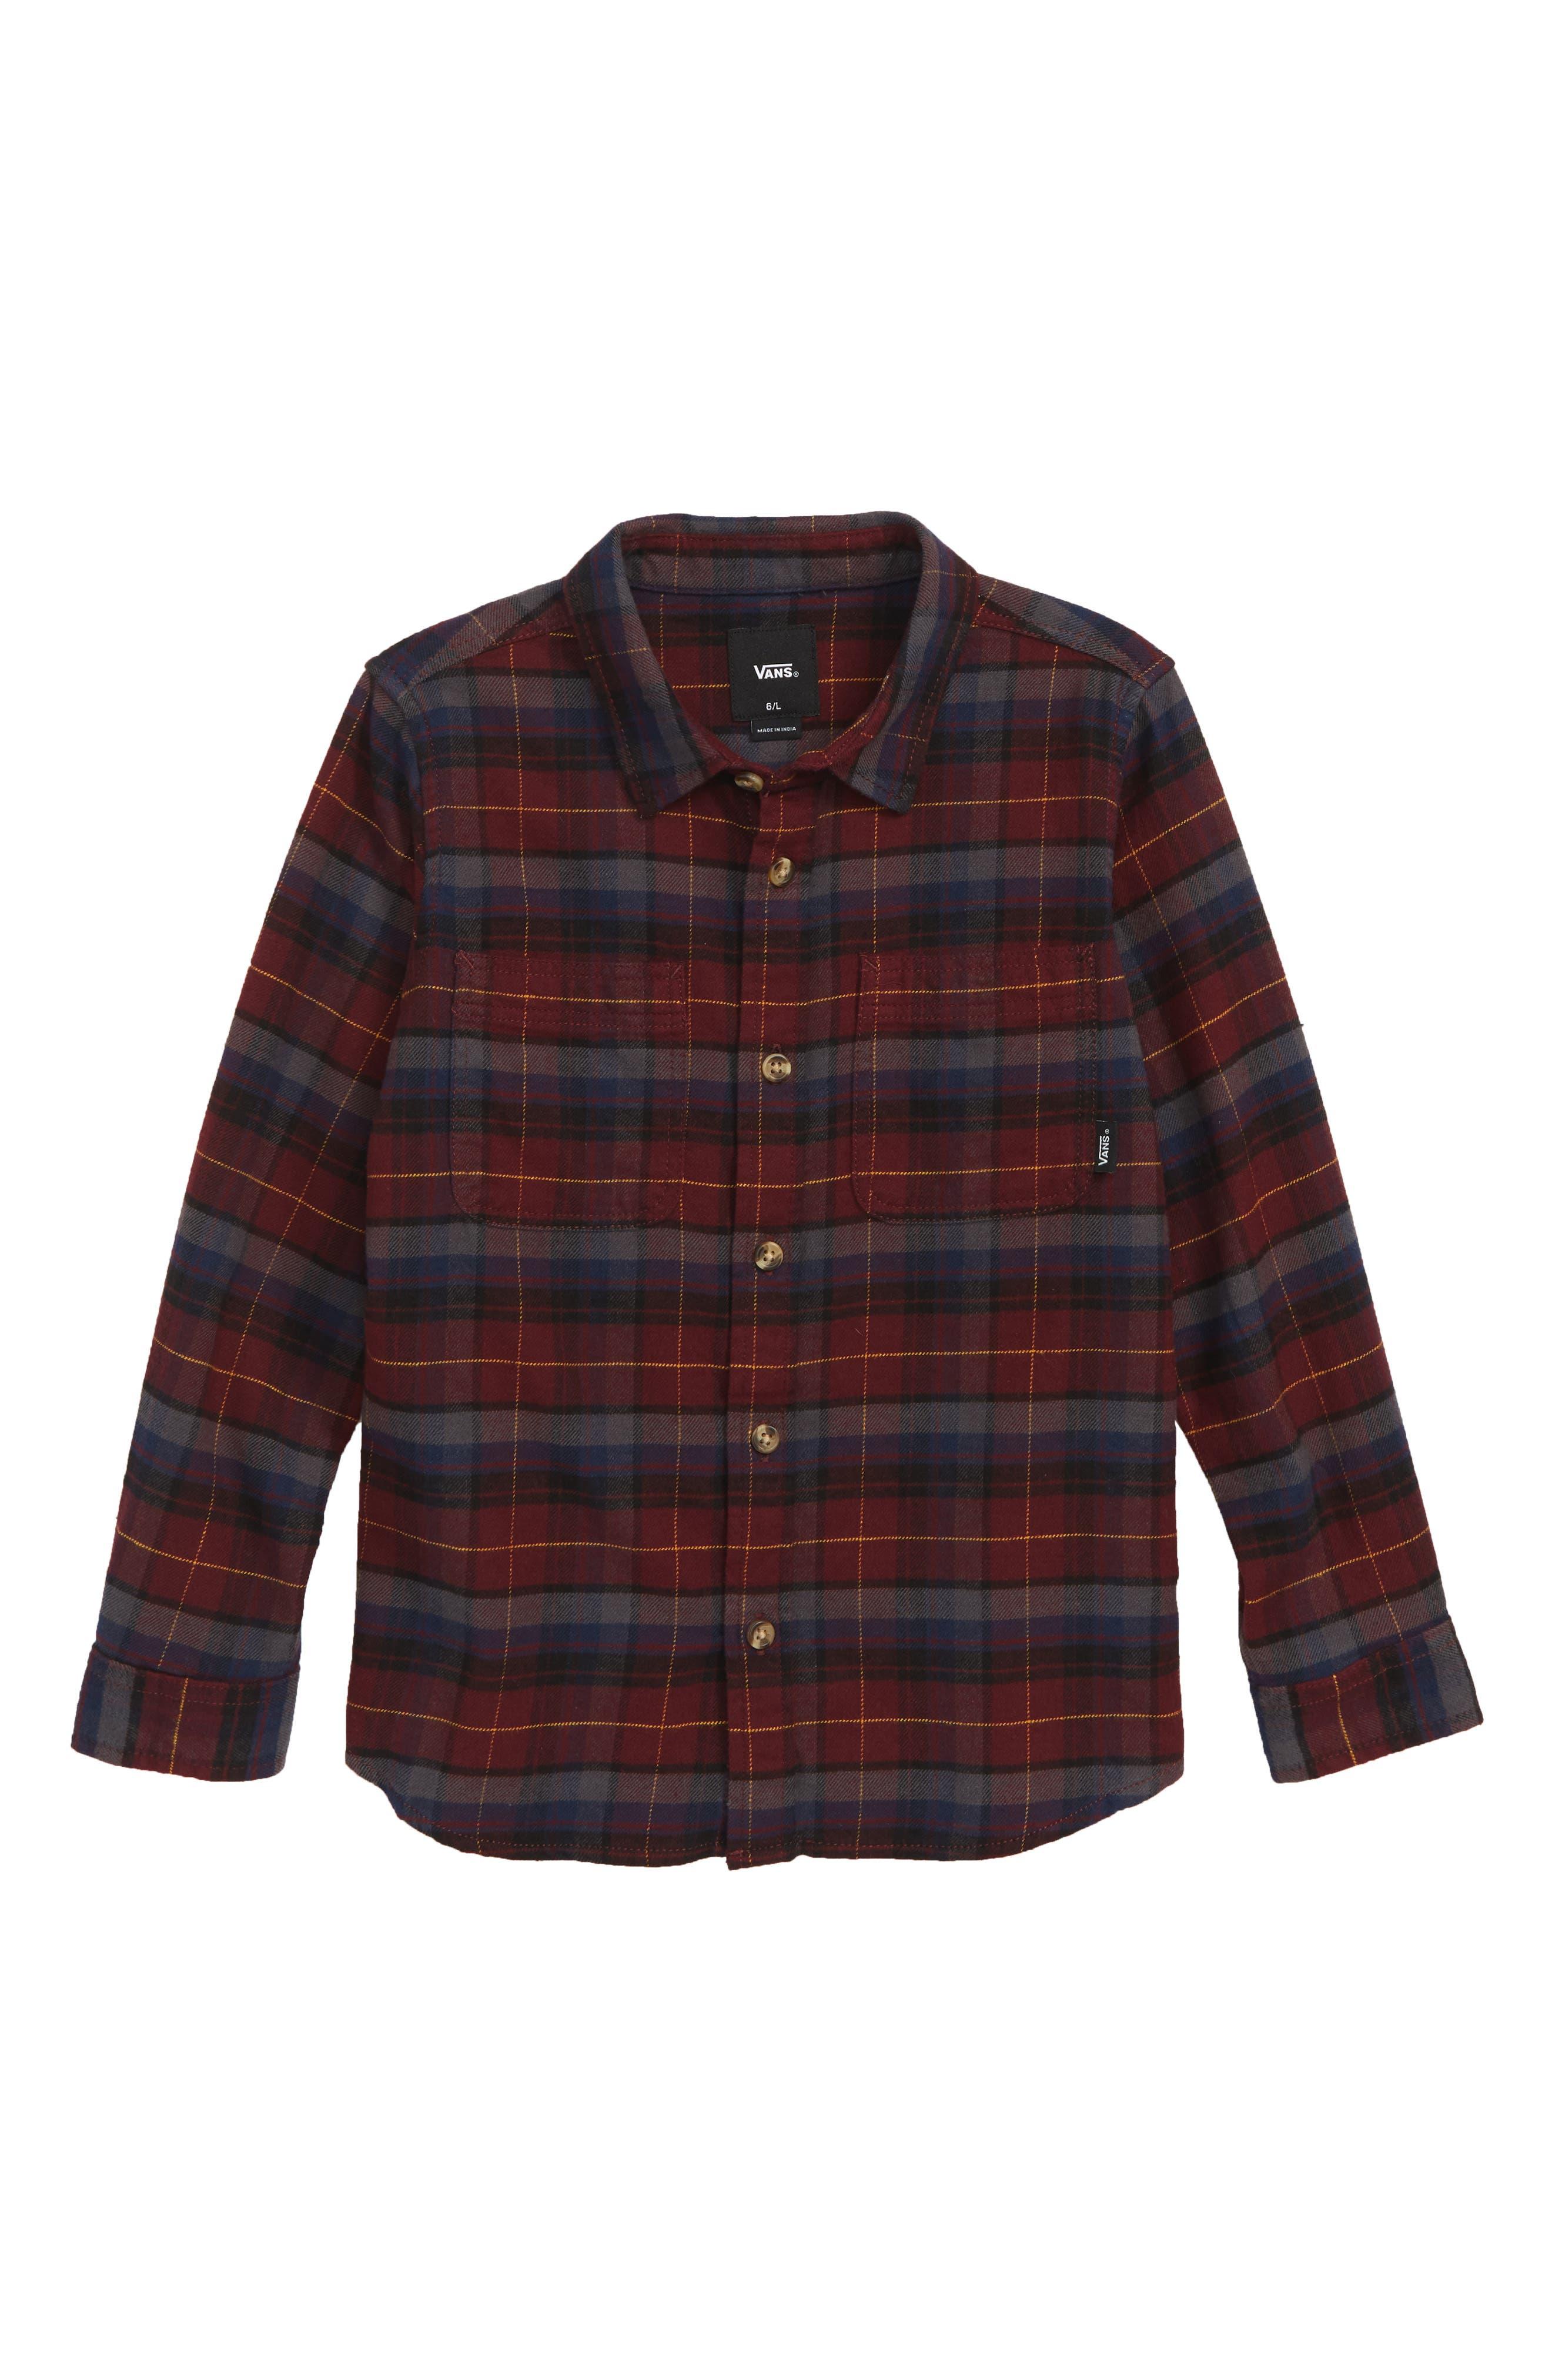 Banfield III Plaid Flannel Shirt,                         Main,                         color, 601